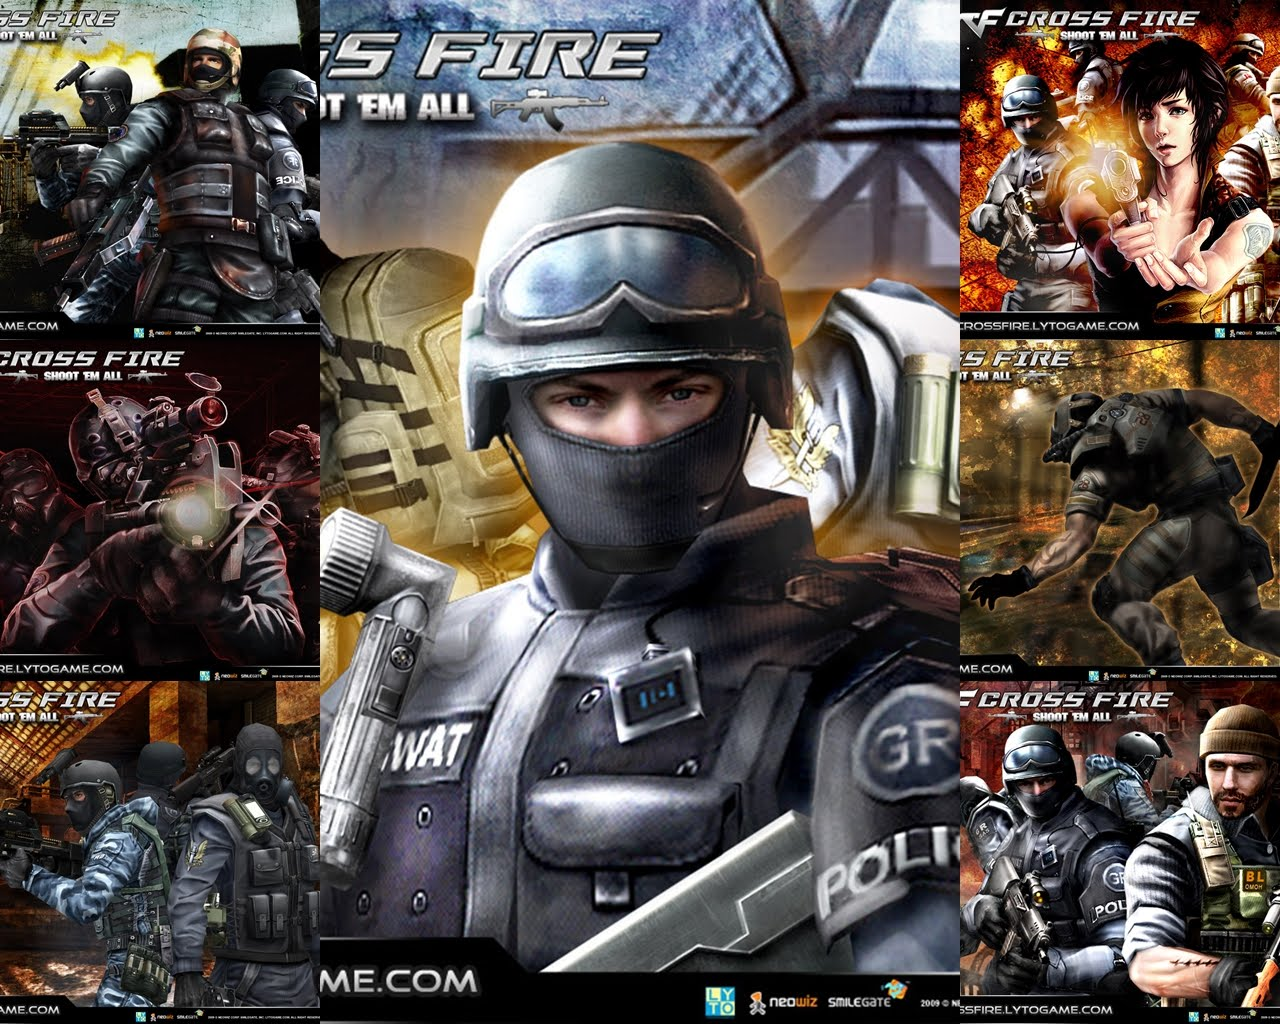 http://3.bp.blogspot.com/-V1d2uzG001w/Tm-OKfgb8hI/AAAAAAAAABc/UHSRgxW9P2Y/s1600/crossfire-game-wallpaper-3d.jpg